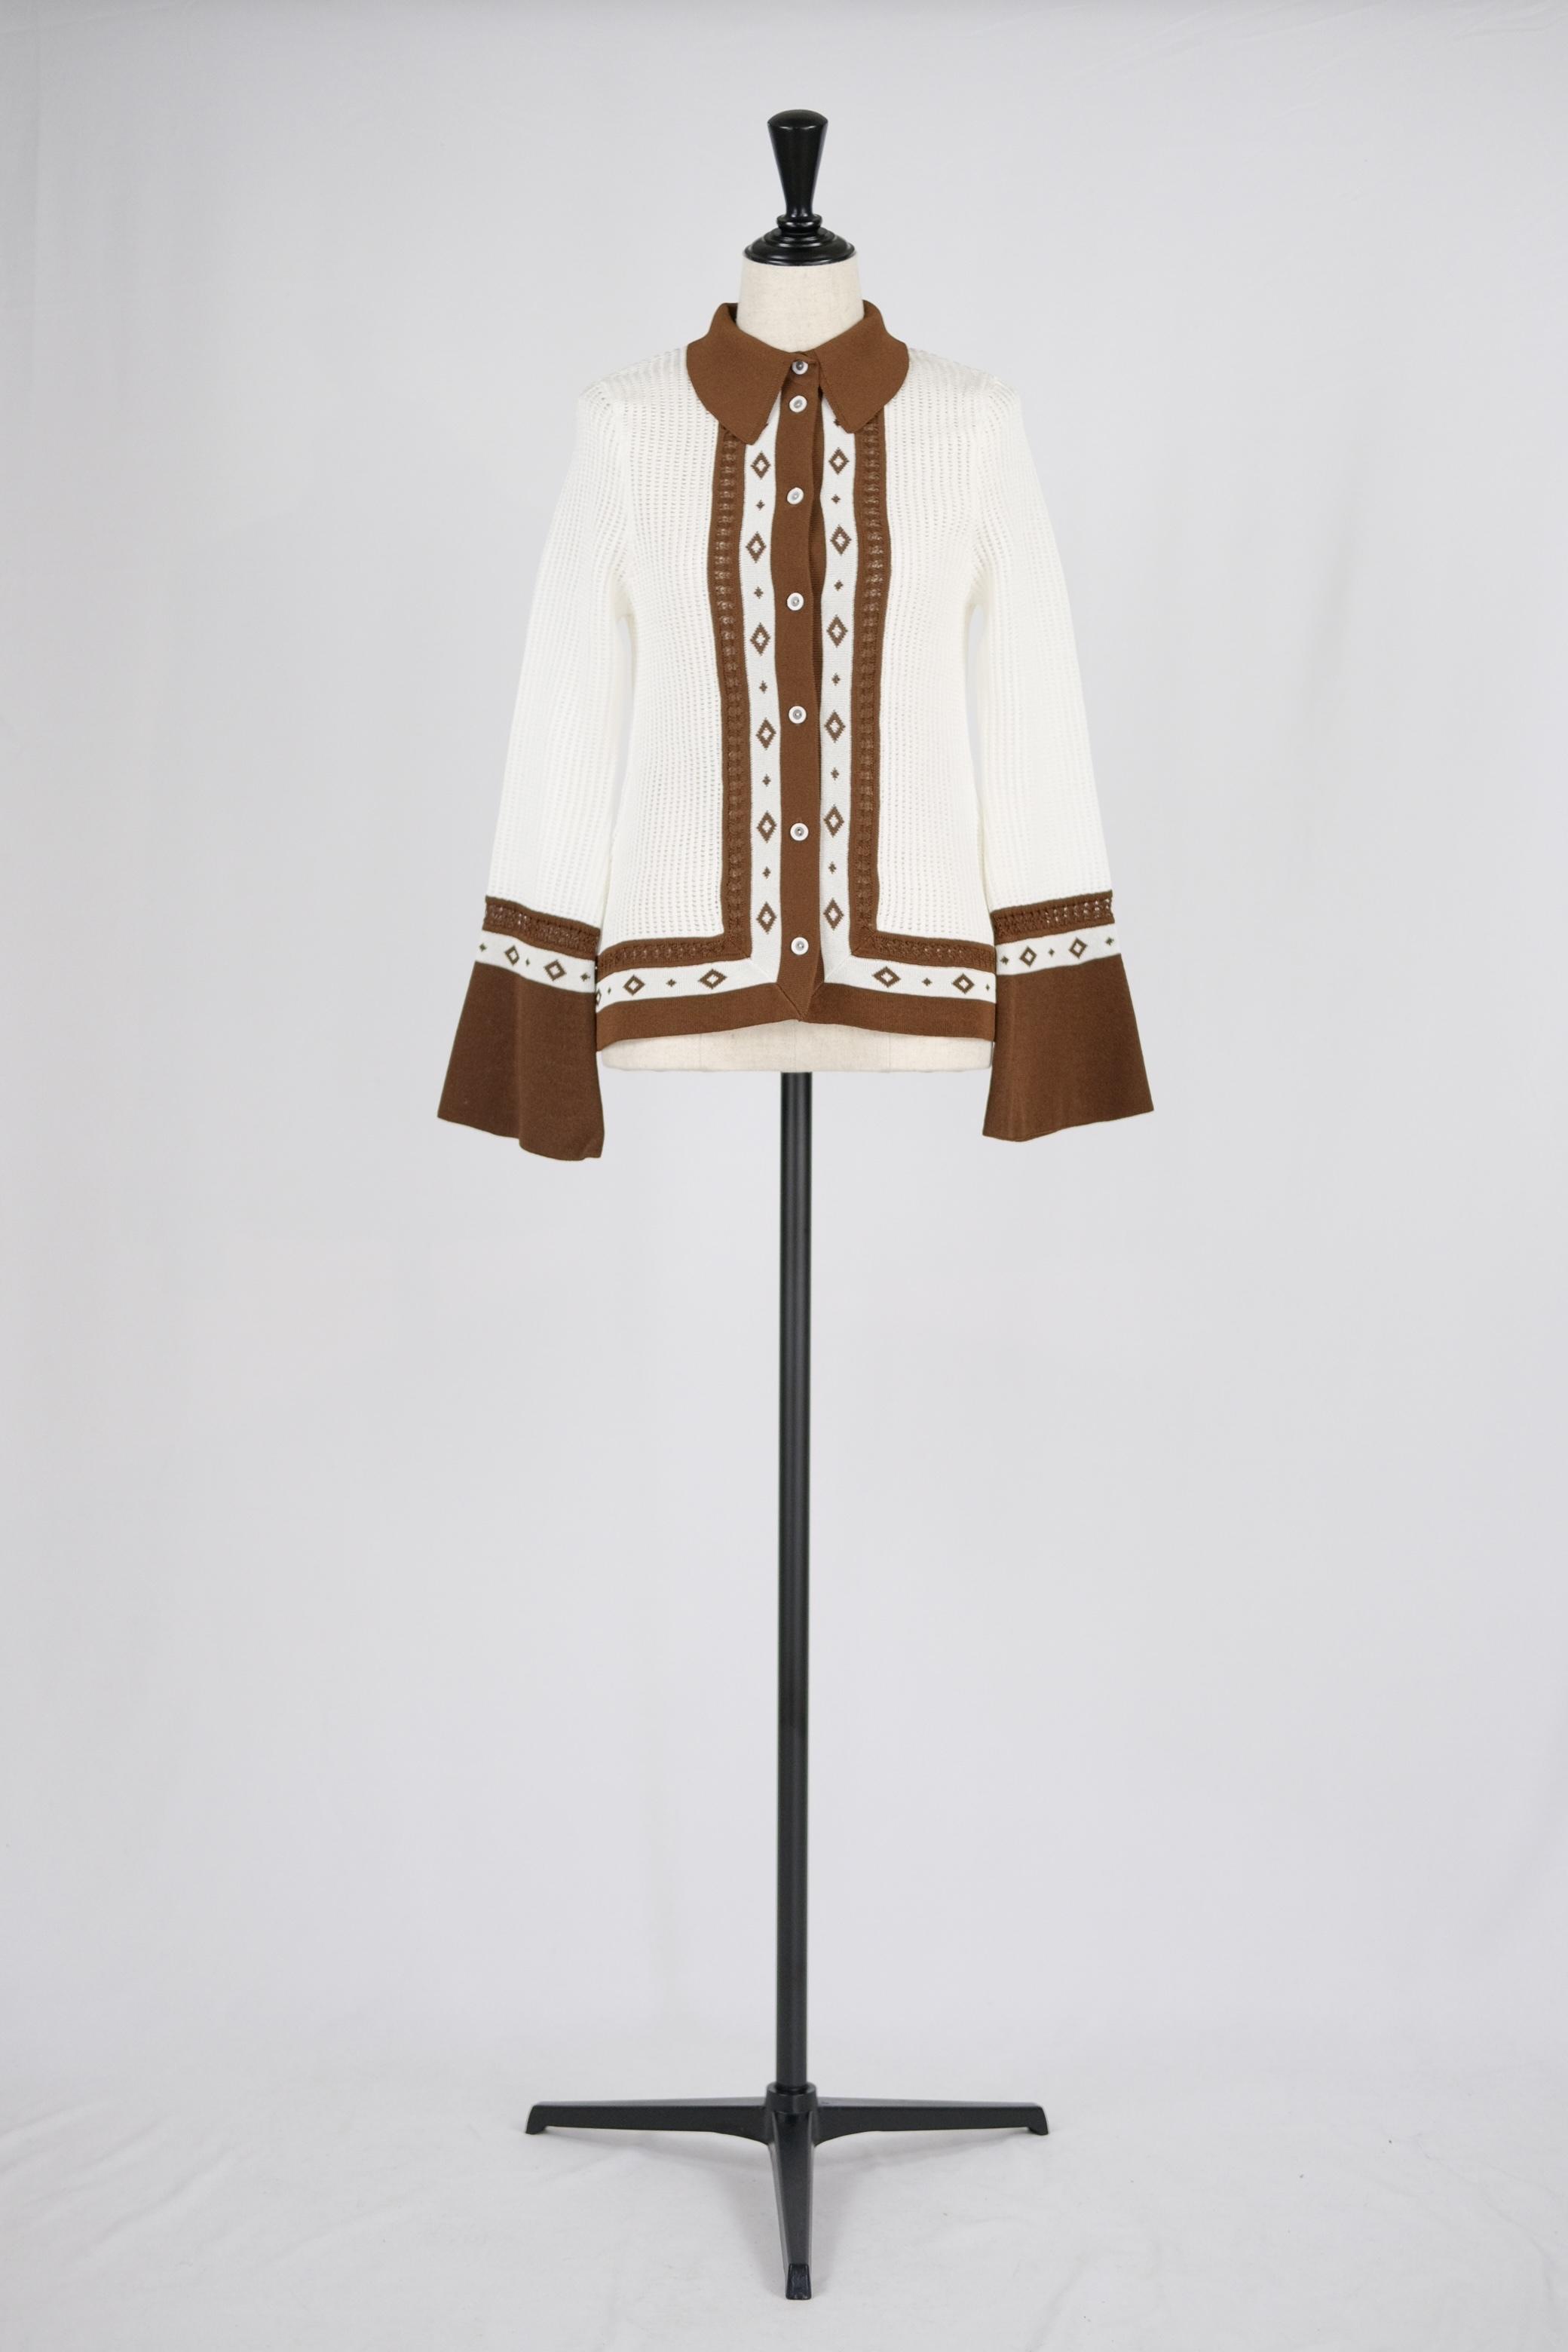 【Mame Kurogouchi】Knitted Shirt with Diamond Pattern - white